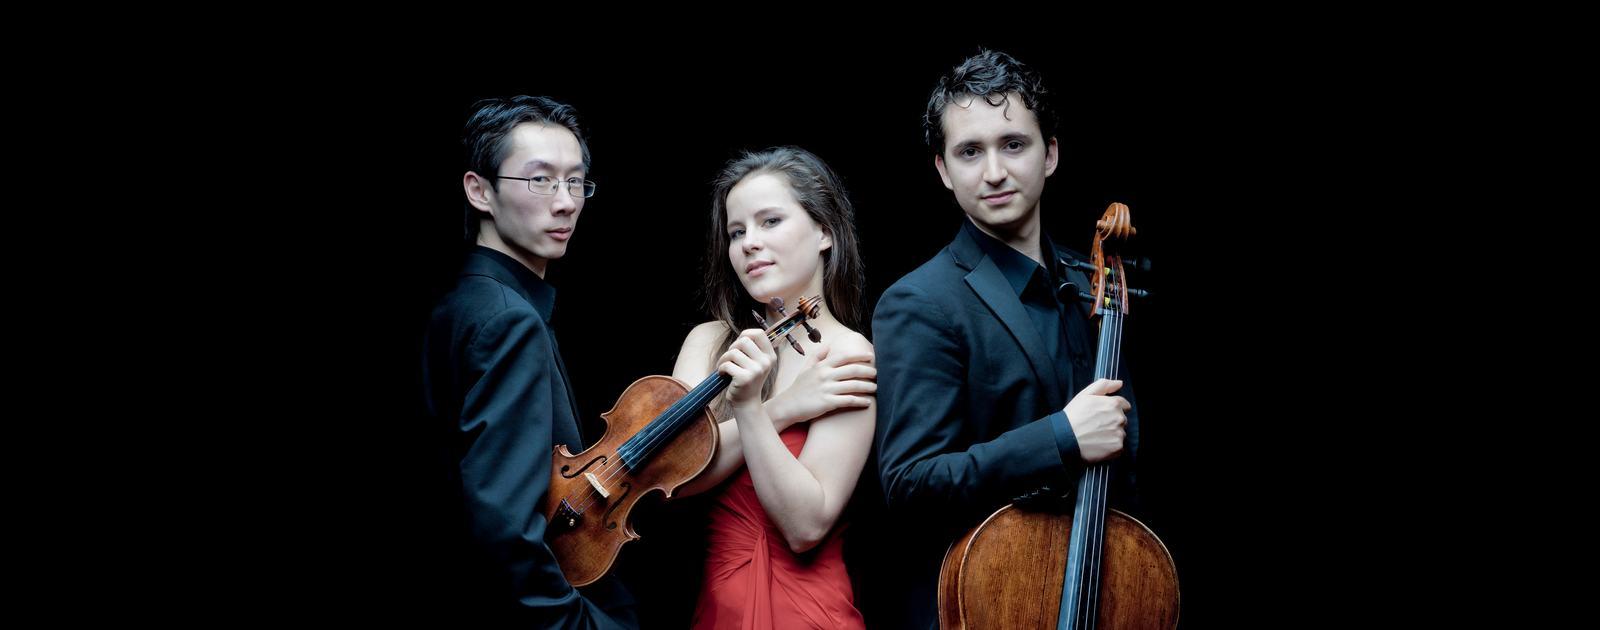 Amatis Piano Trio..Photo: Marco Borggreve